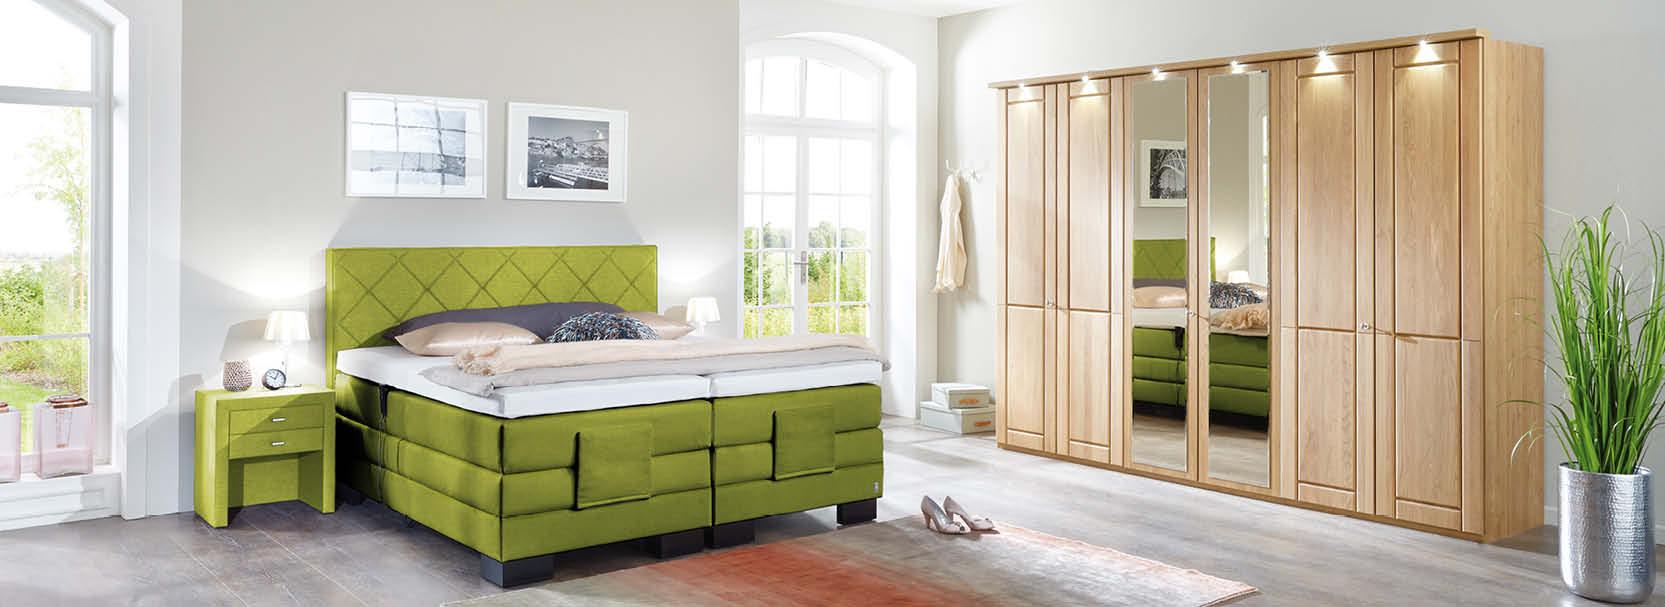 inspirationen keser home company m beltrends in 3 filialen. Black Bedroom Furniture Sets. Home Design Ideas